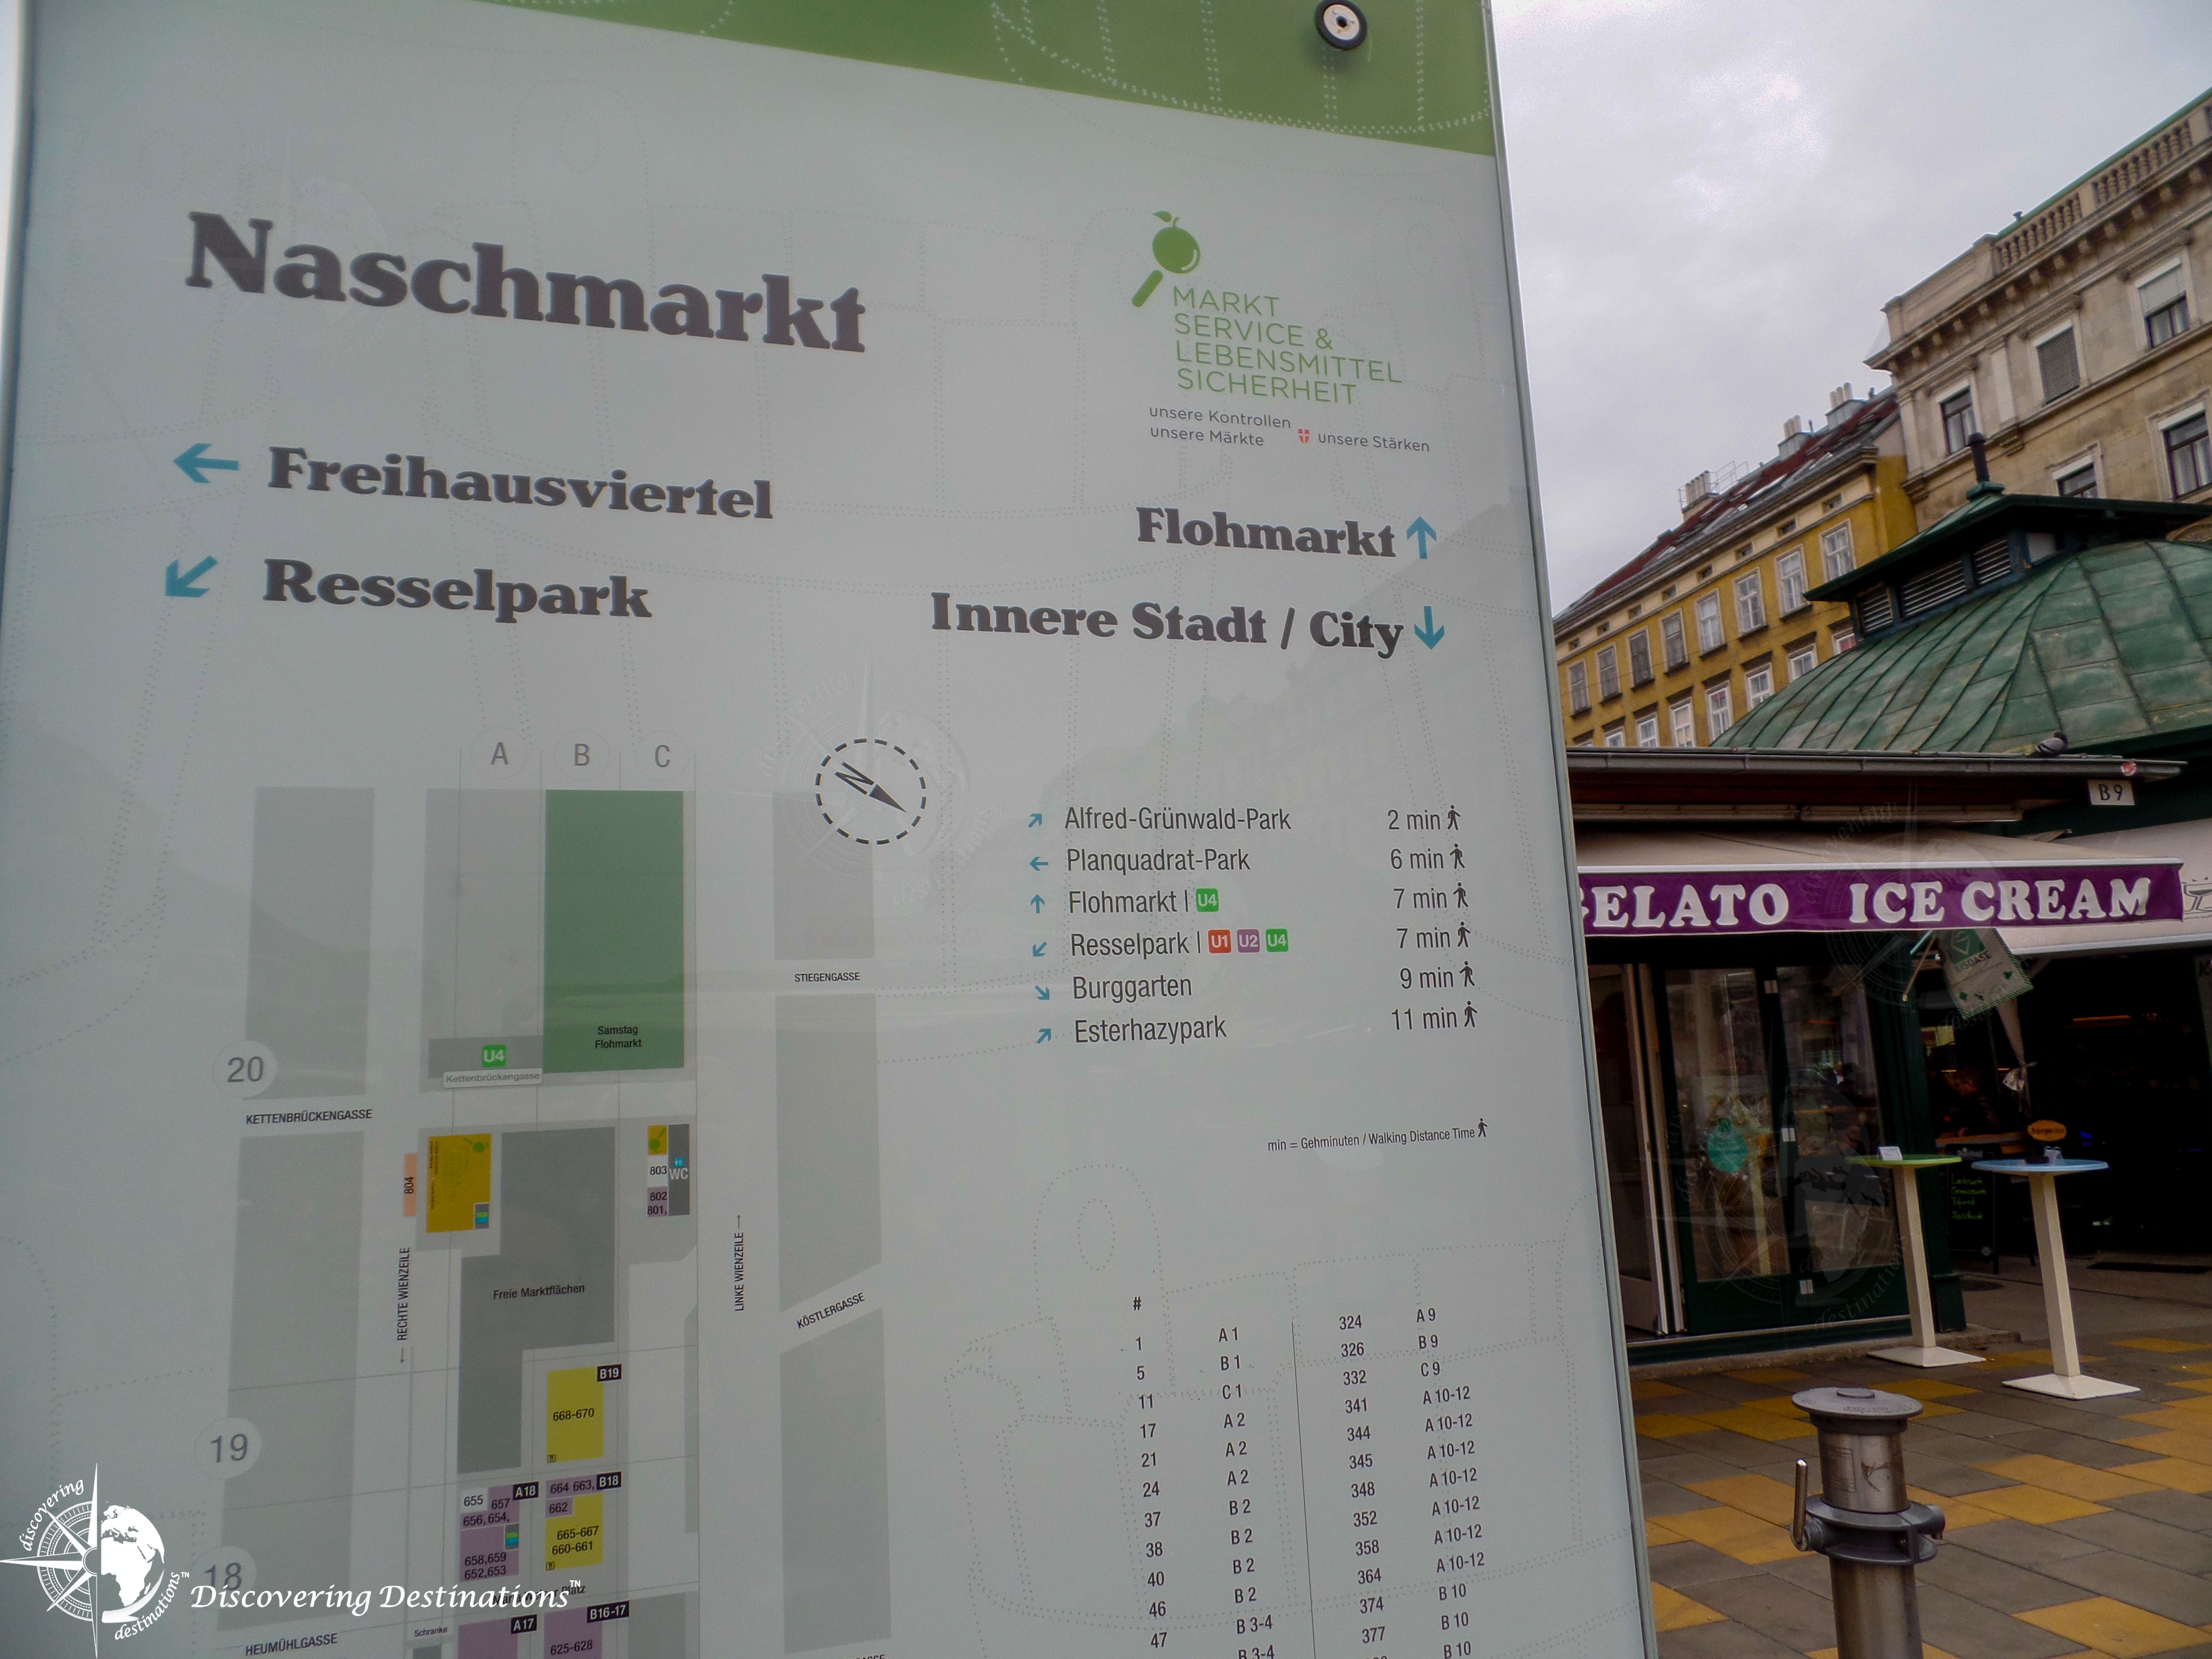 Discovering Naschmarkt